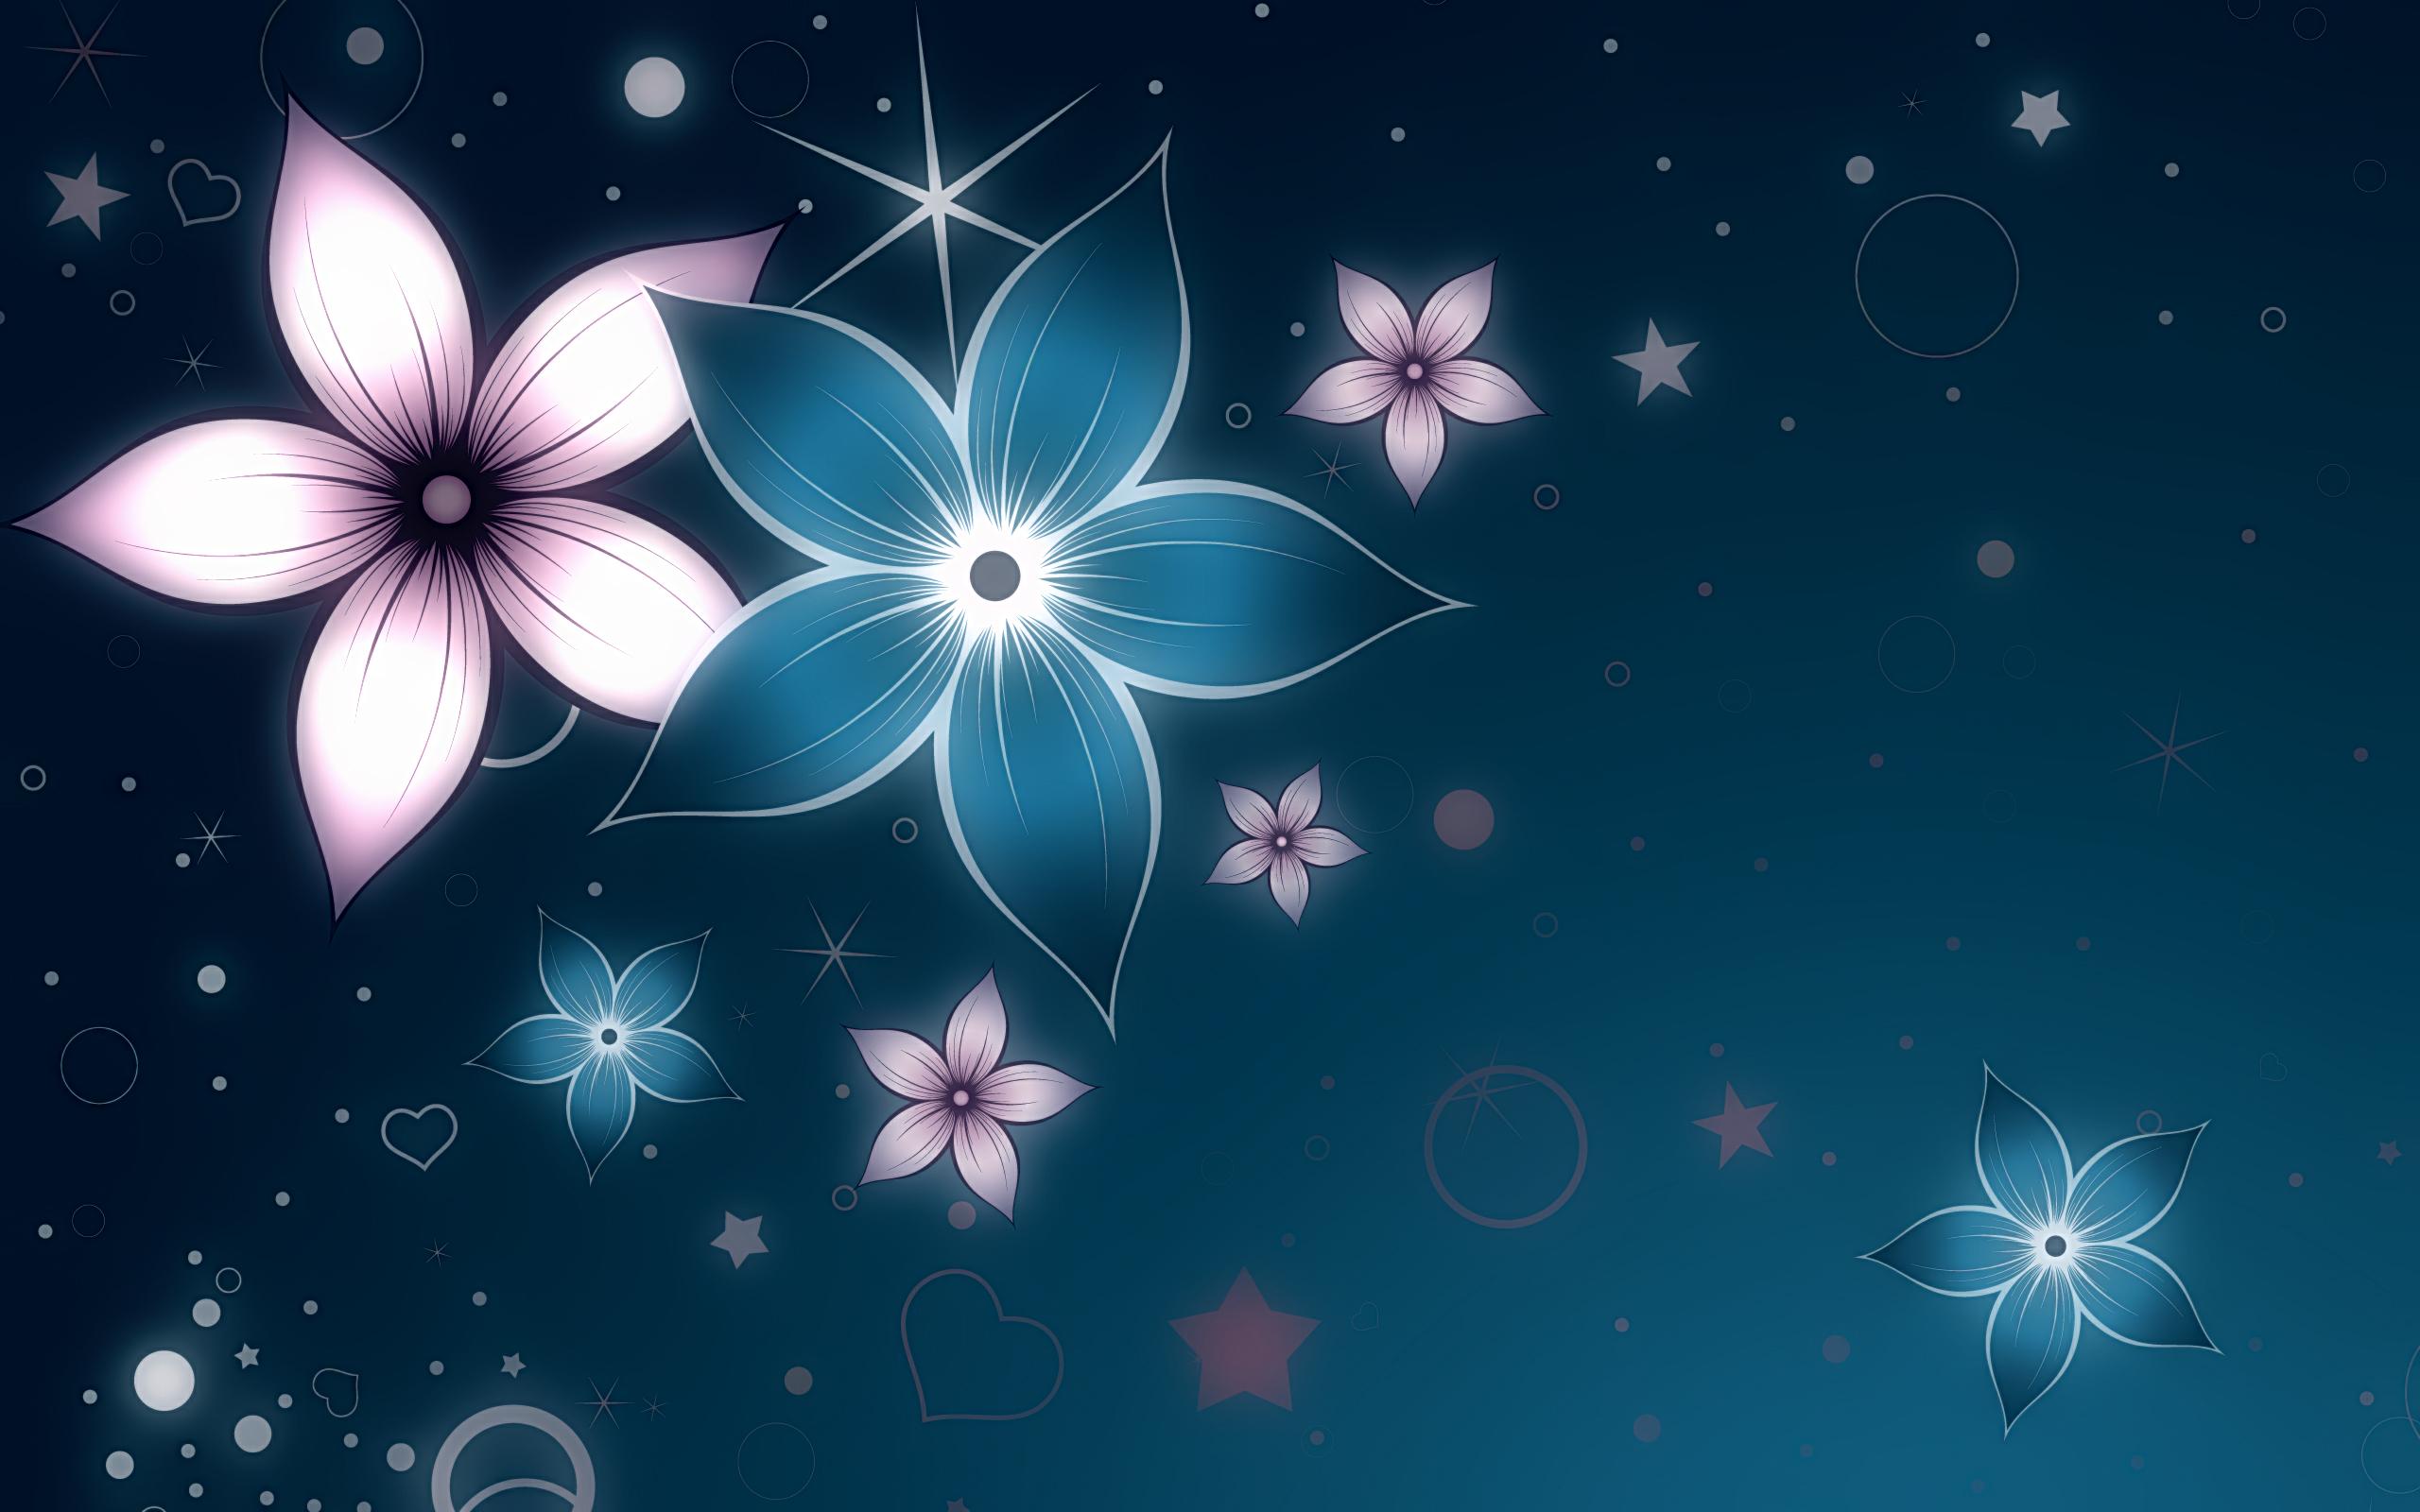 bigflowers by nucu